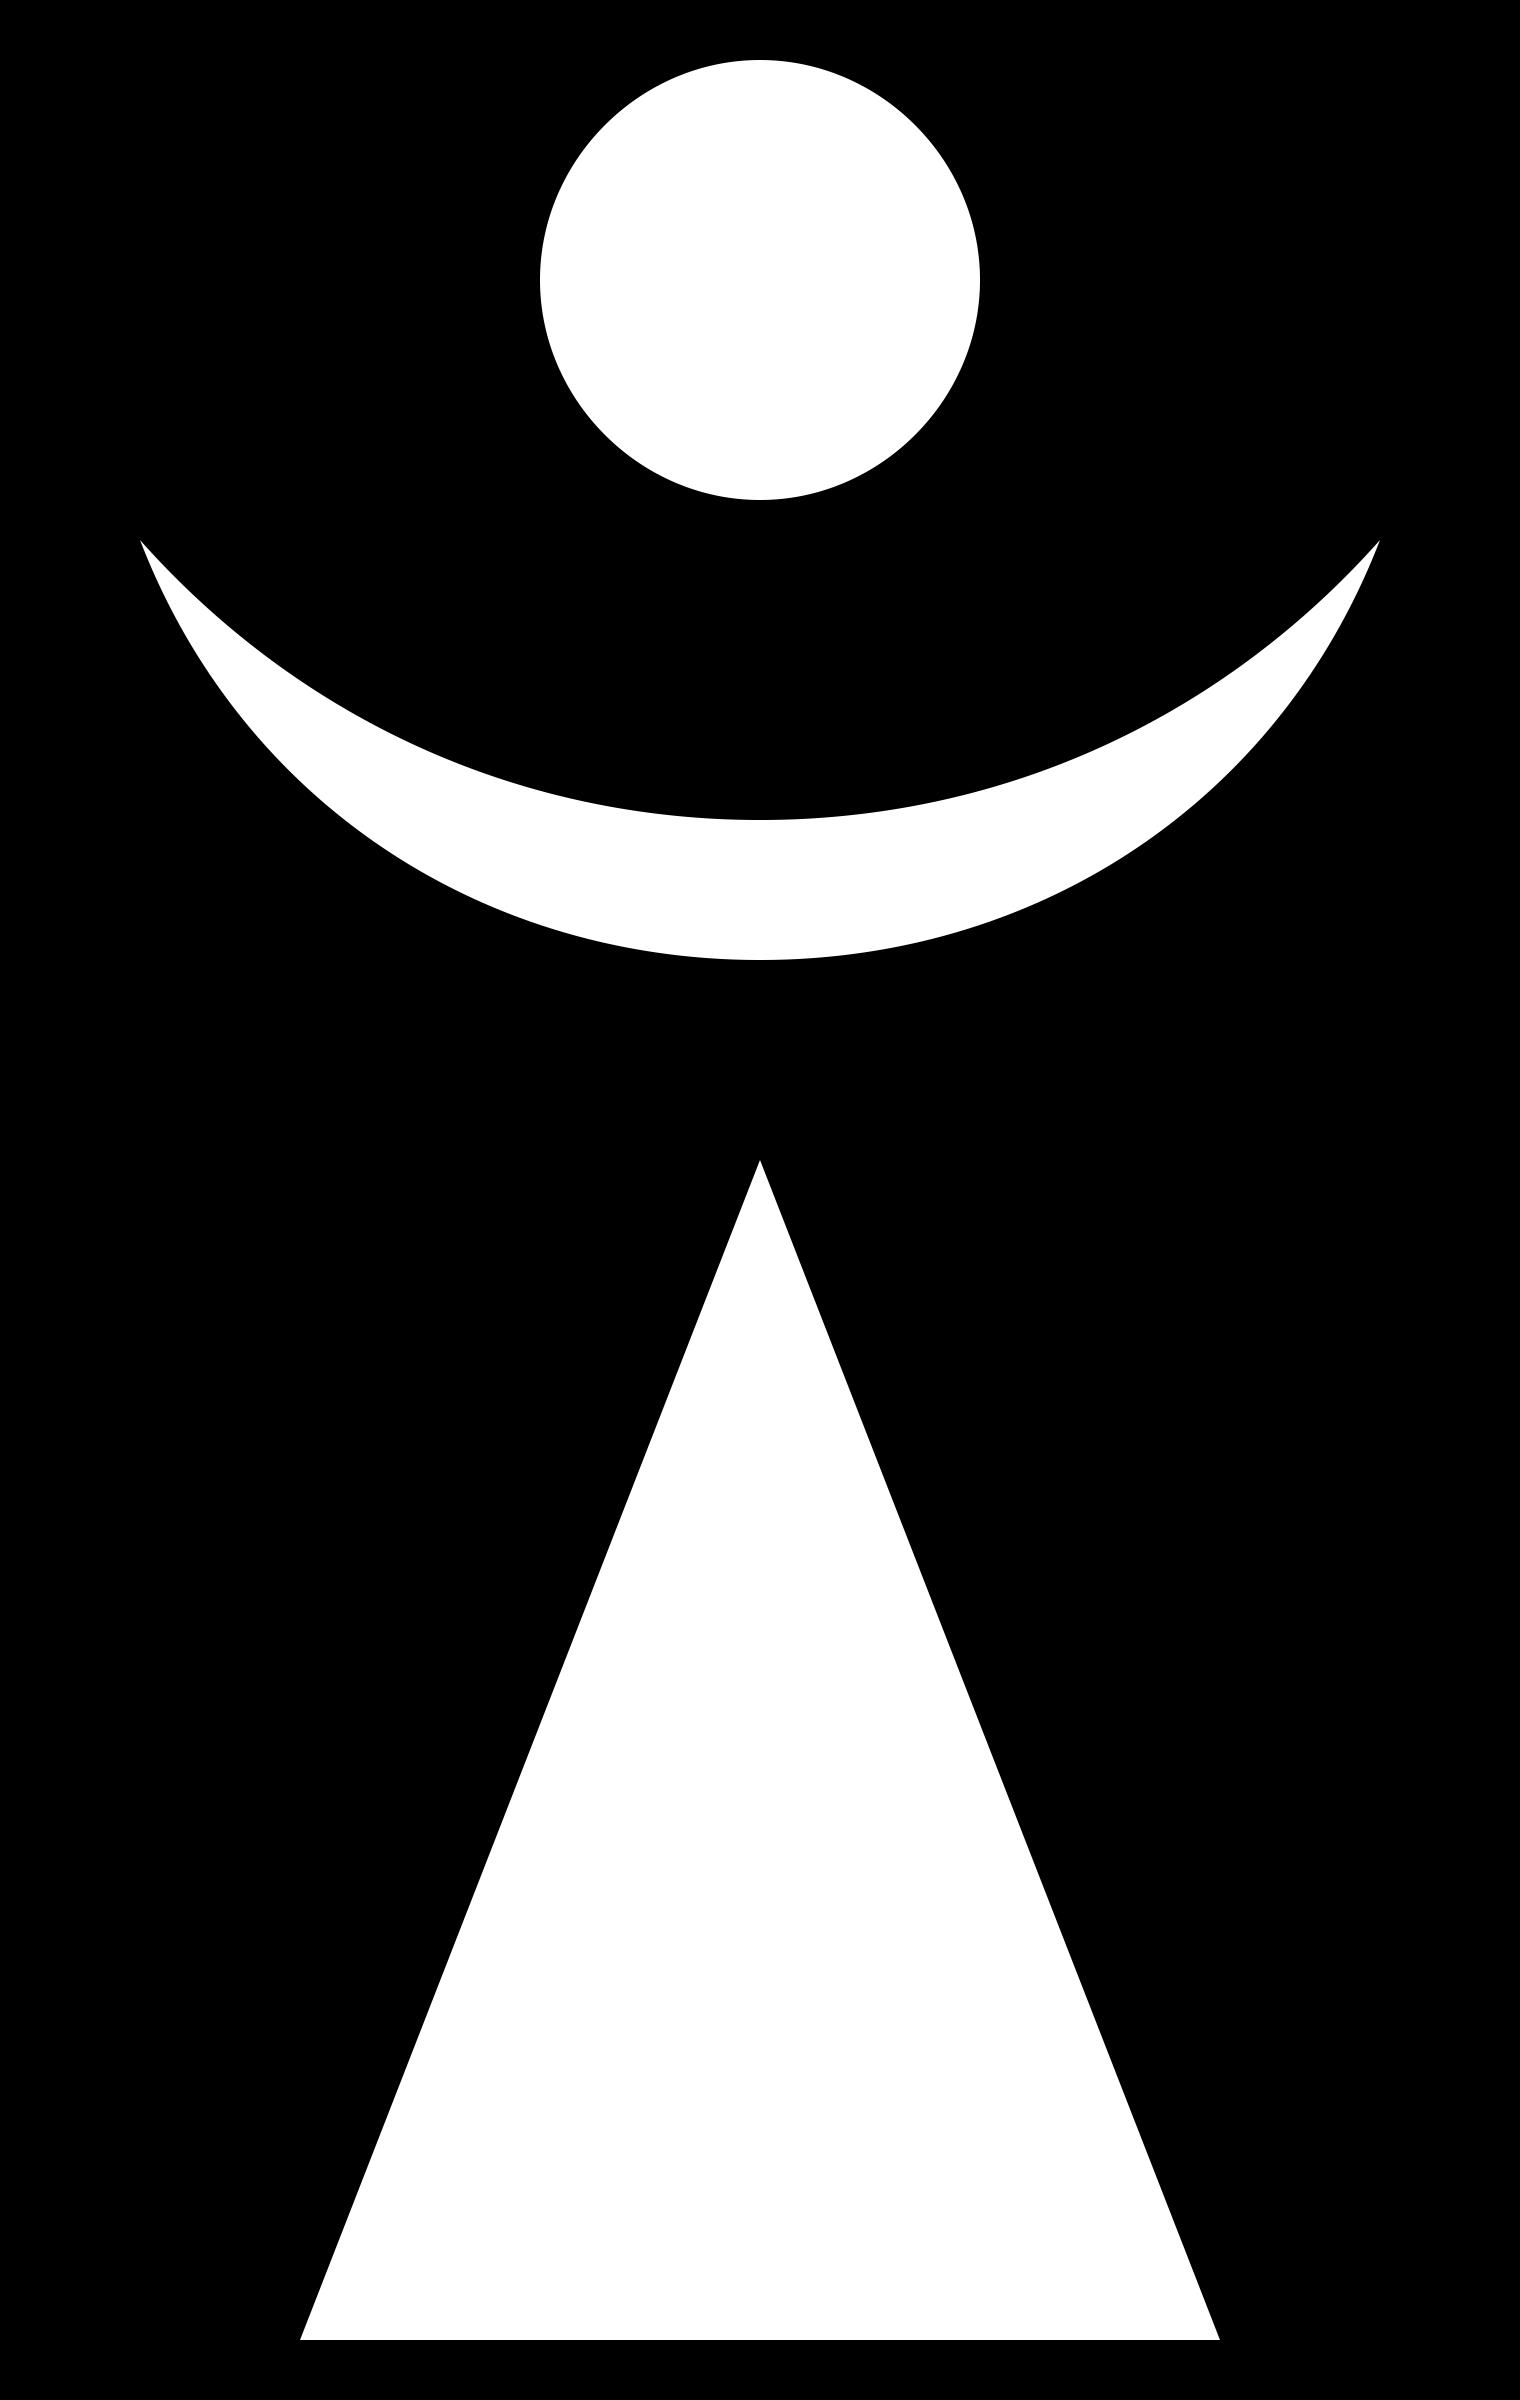 Egypt clipart symbol, Egypt symbol Transparent FREE for.